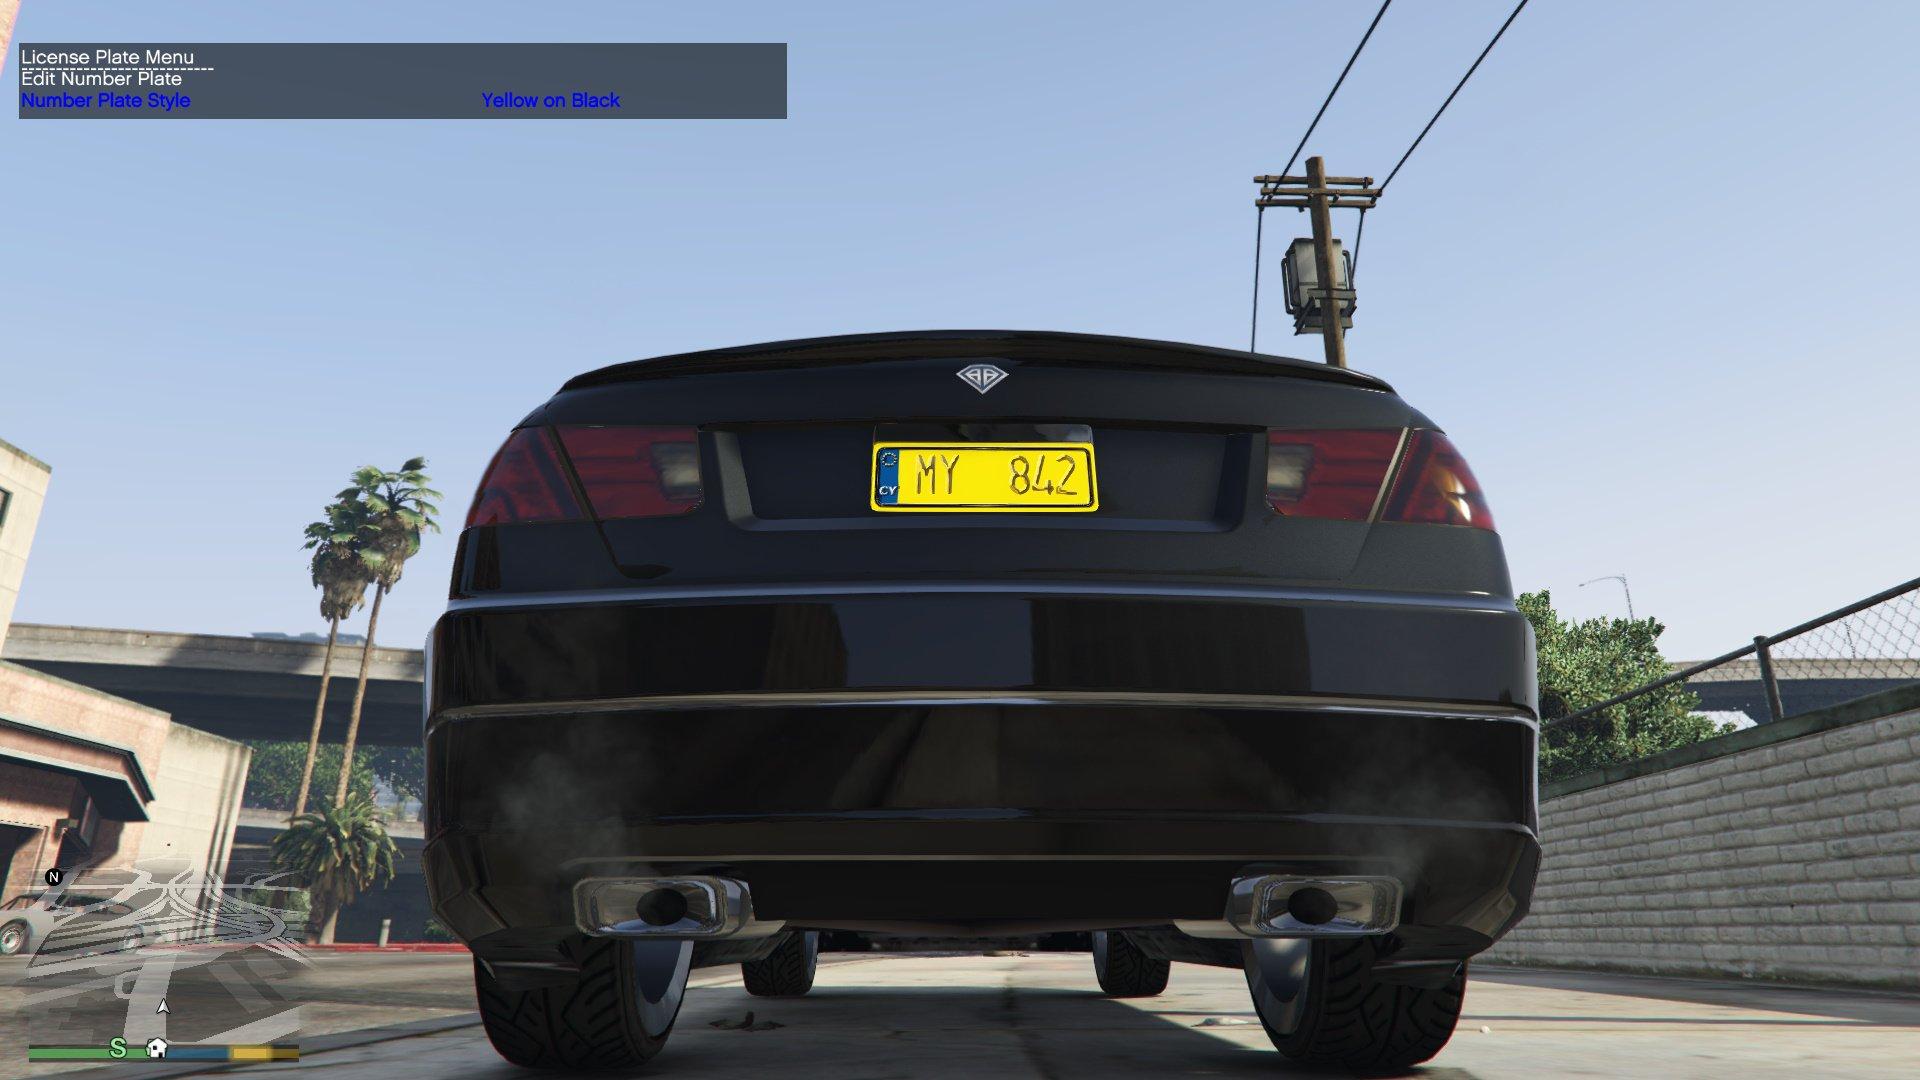 European Licence Plates Pack & Normals - GTA5-Mods.com